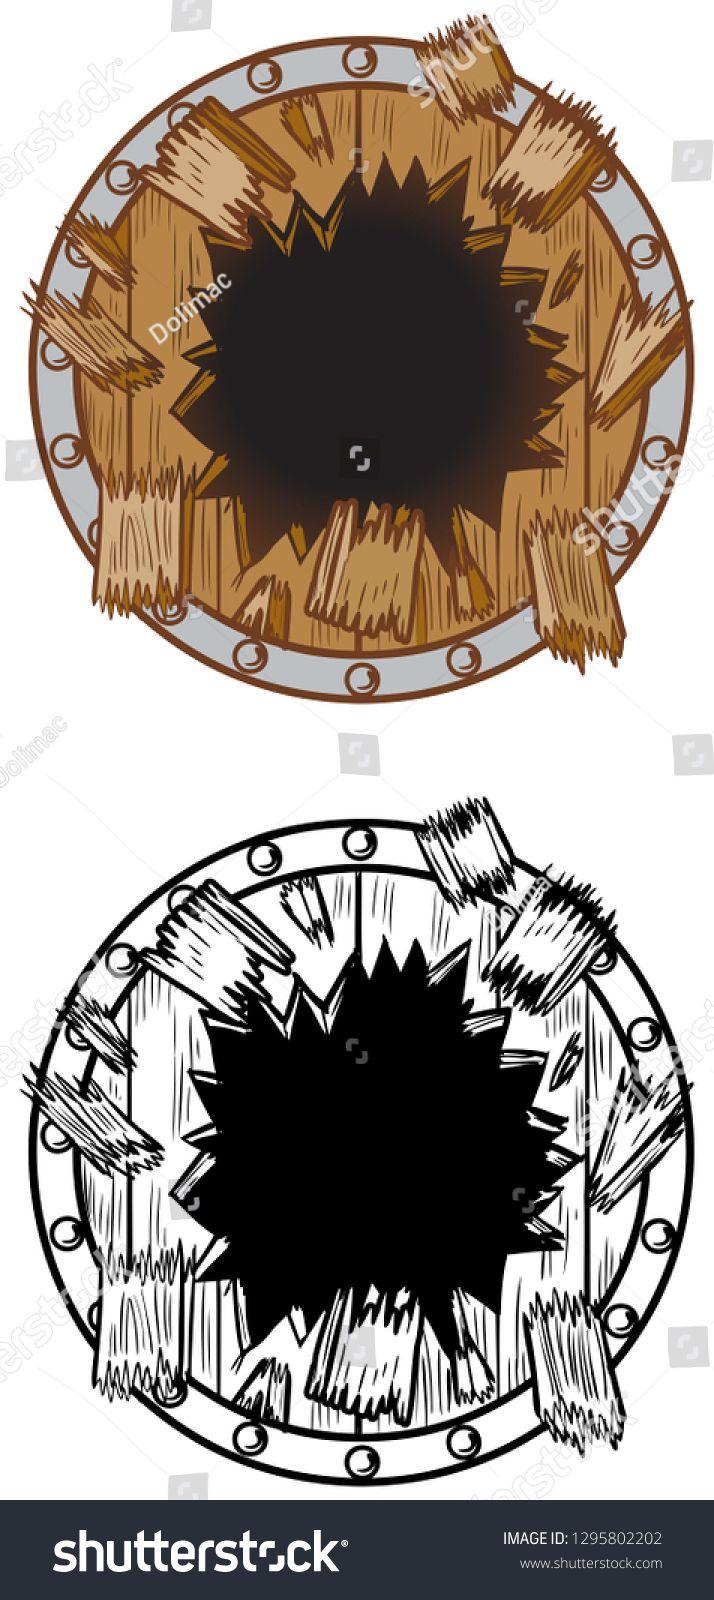 Vector cartoon clip art illustration of a hole in a wood